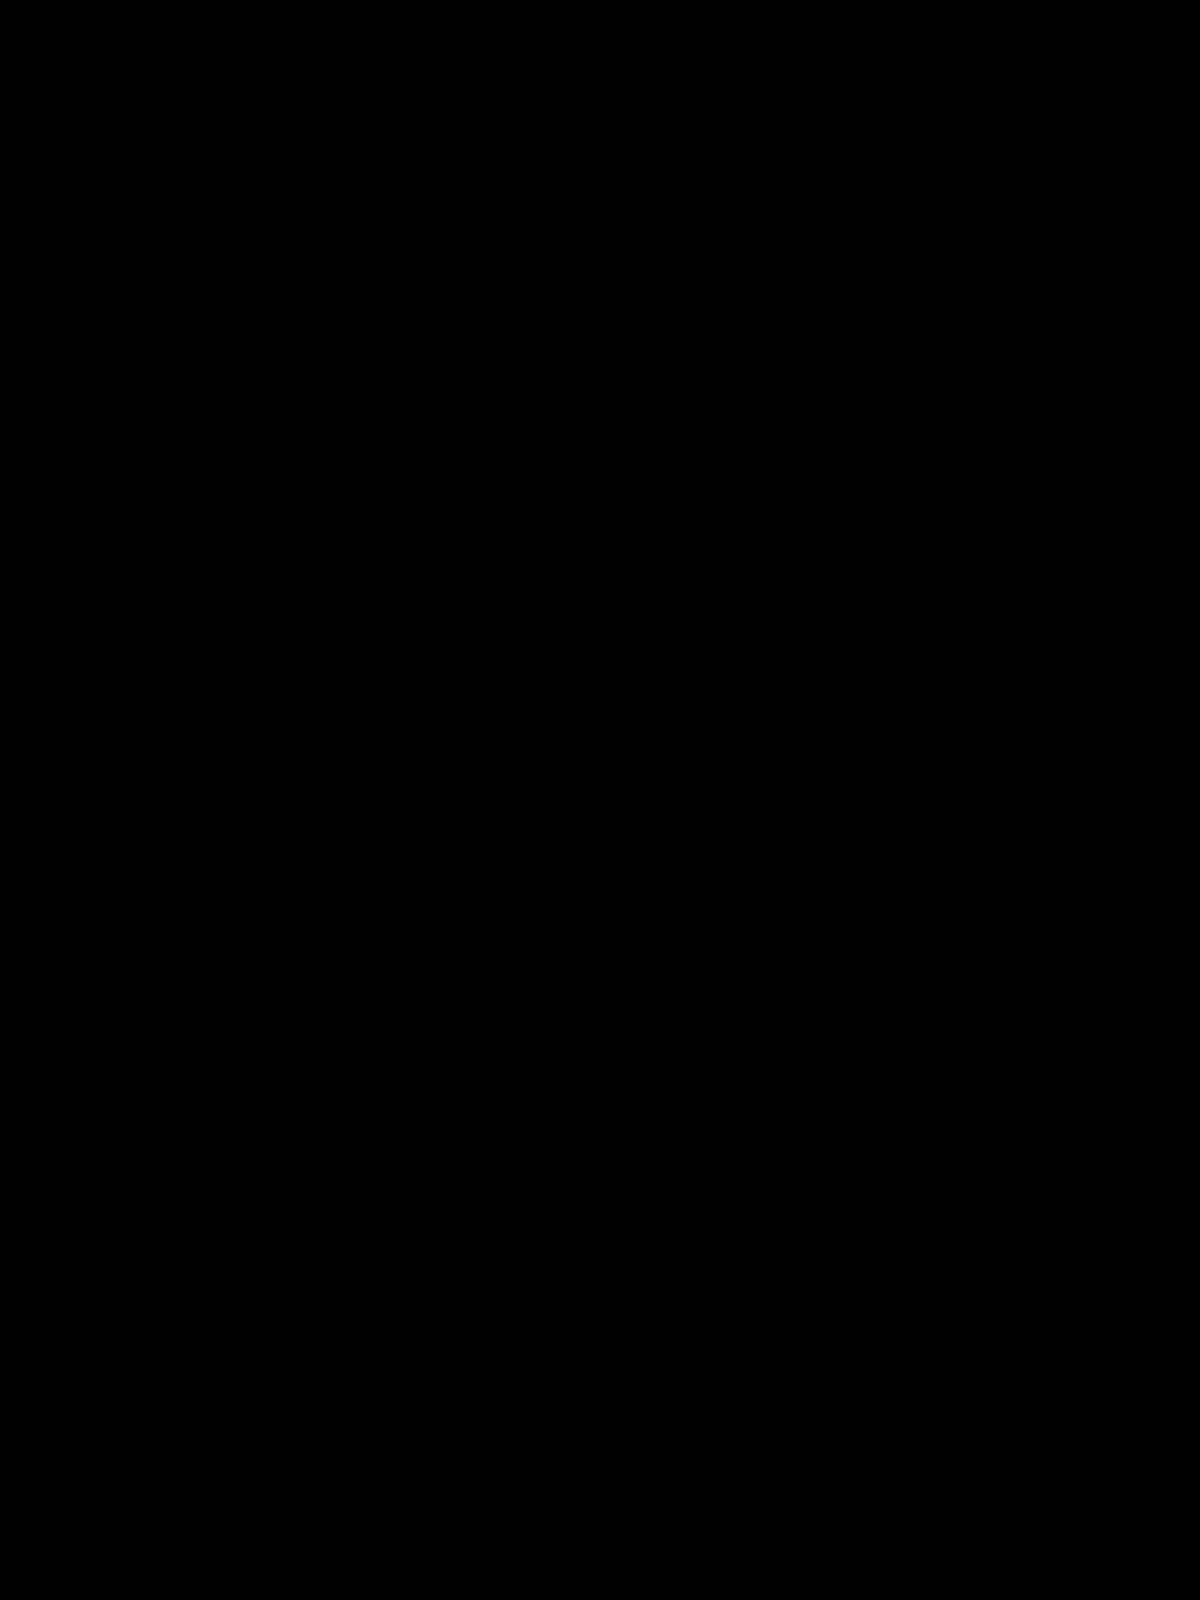 diego-giovanni-spina